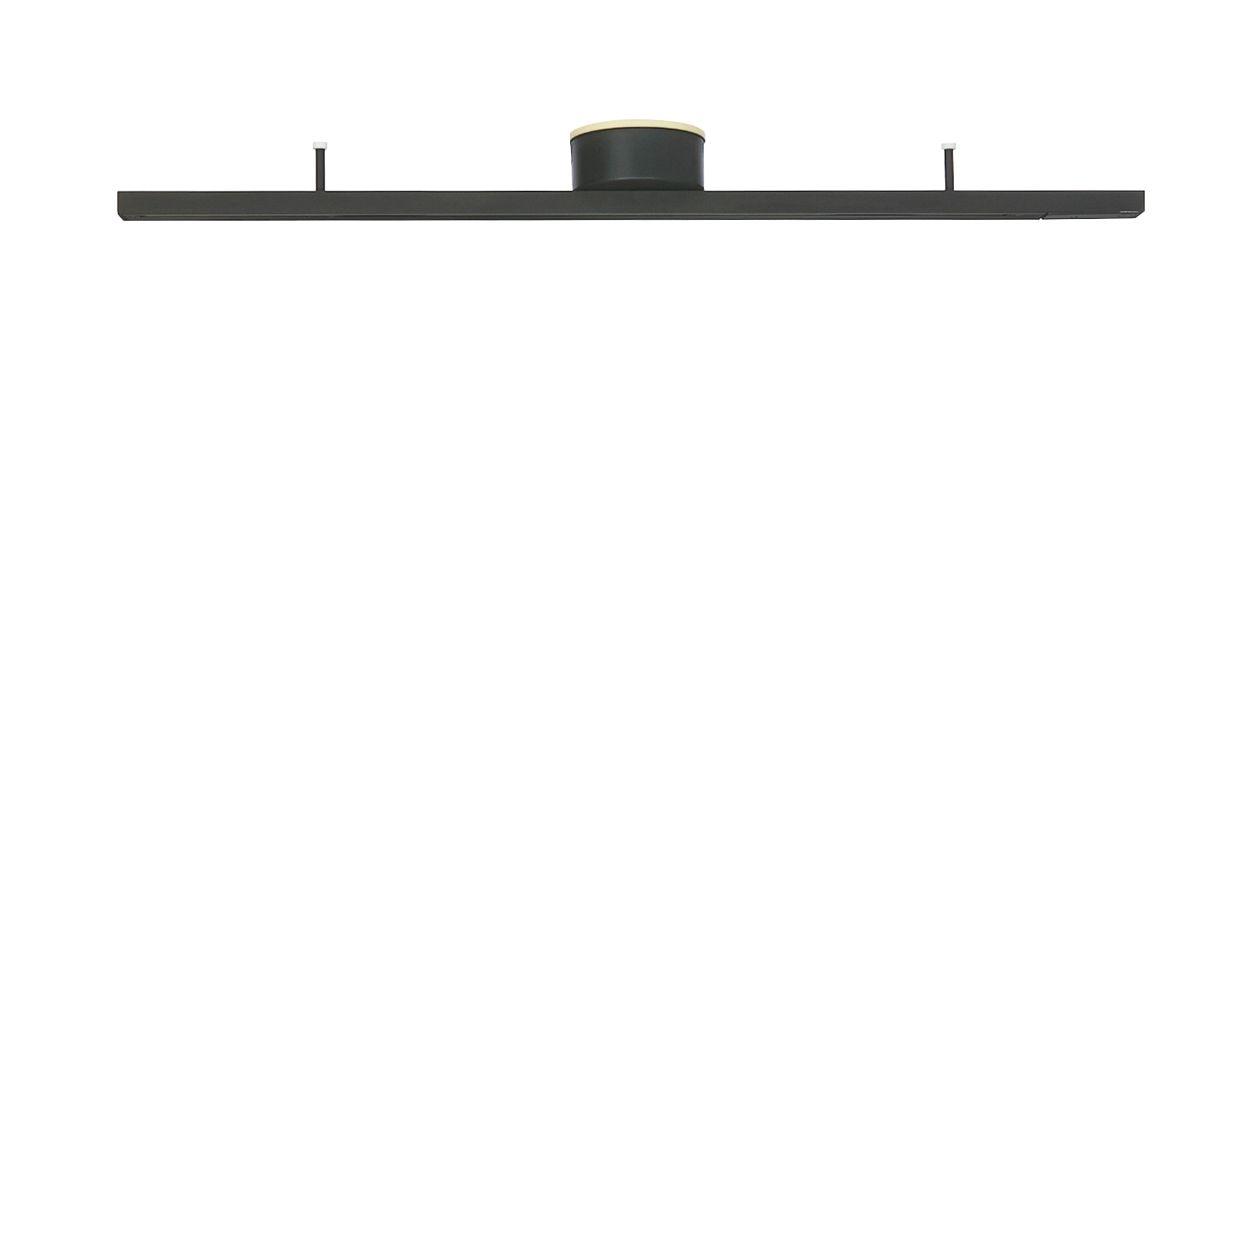 RoomClip商品情報 - システムライト本体/ブラック ブラック